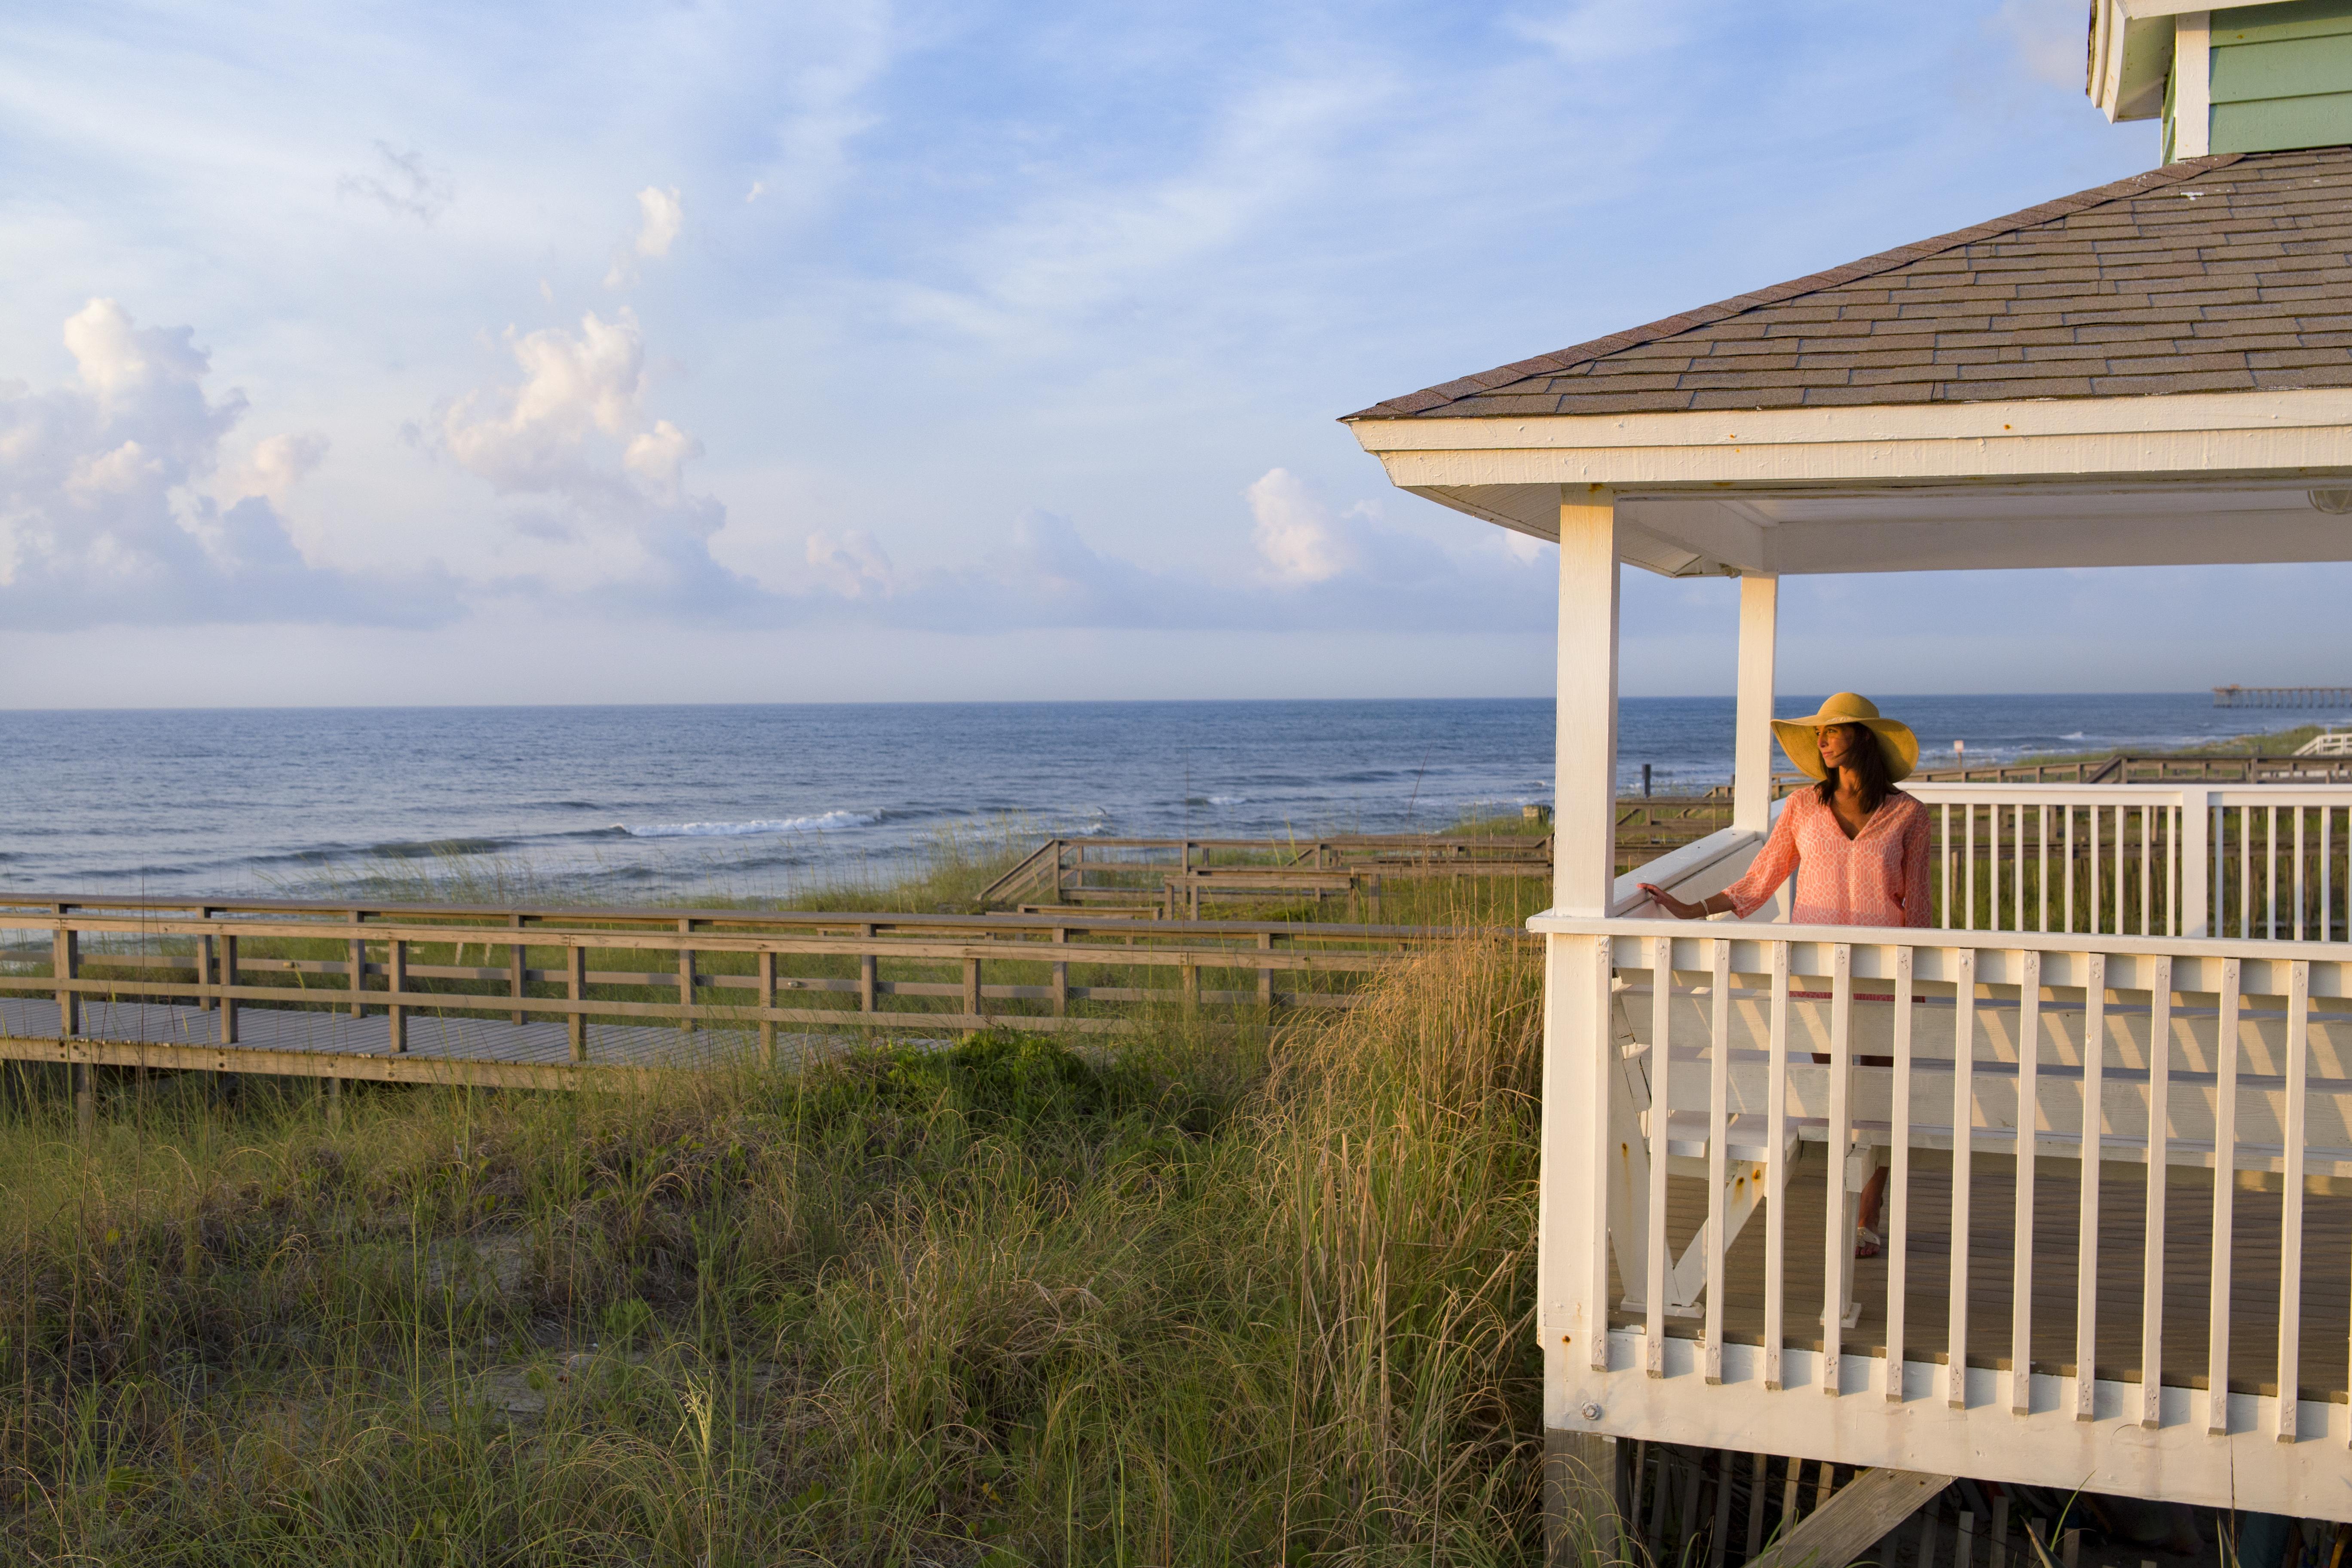 Kure Beach, NC Press Releases | Press and Media